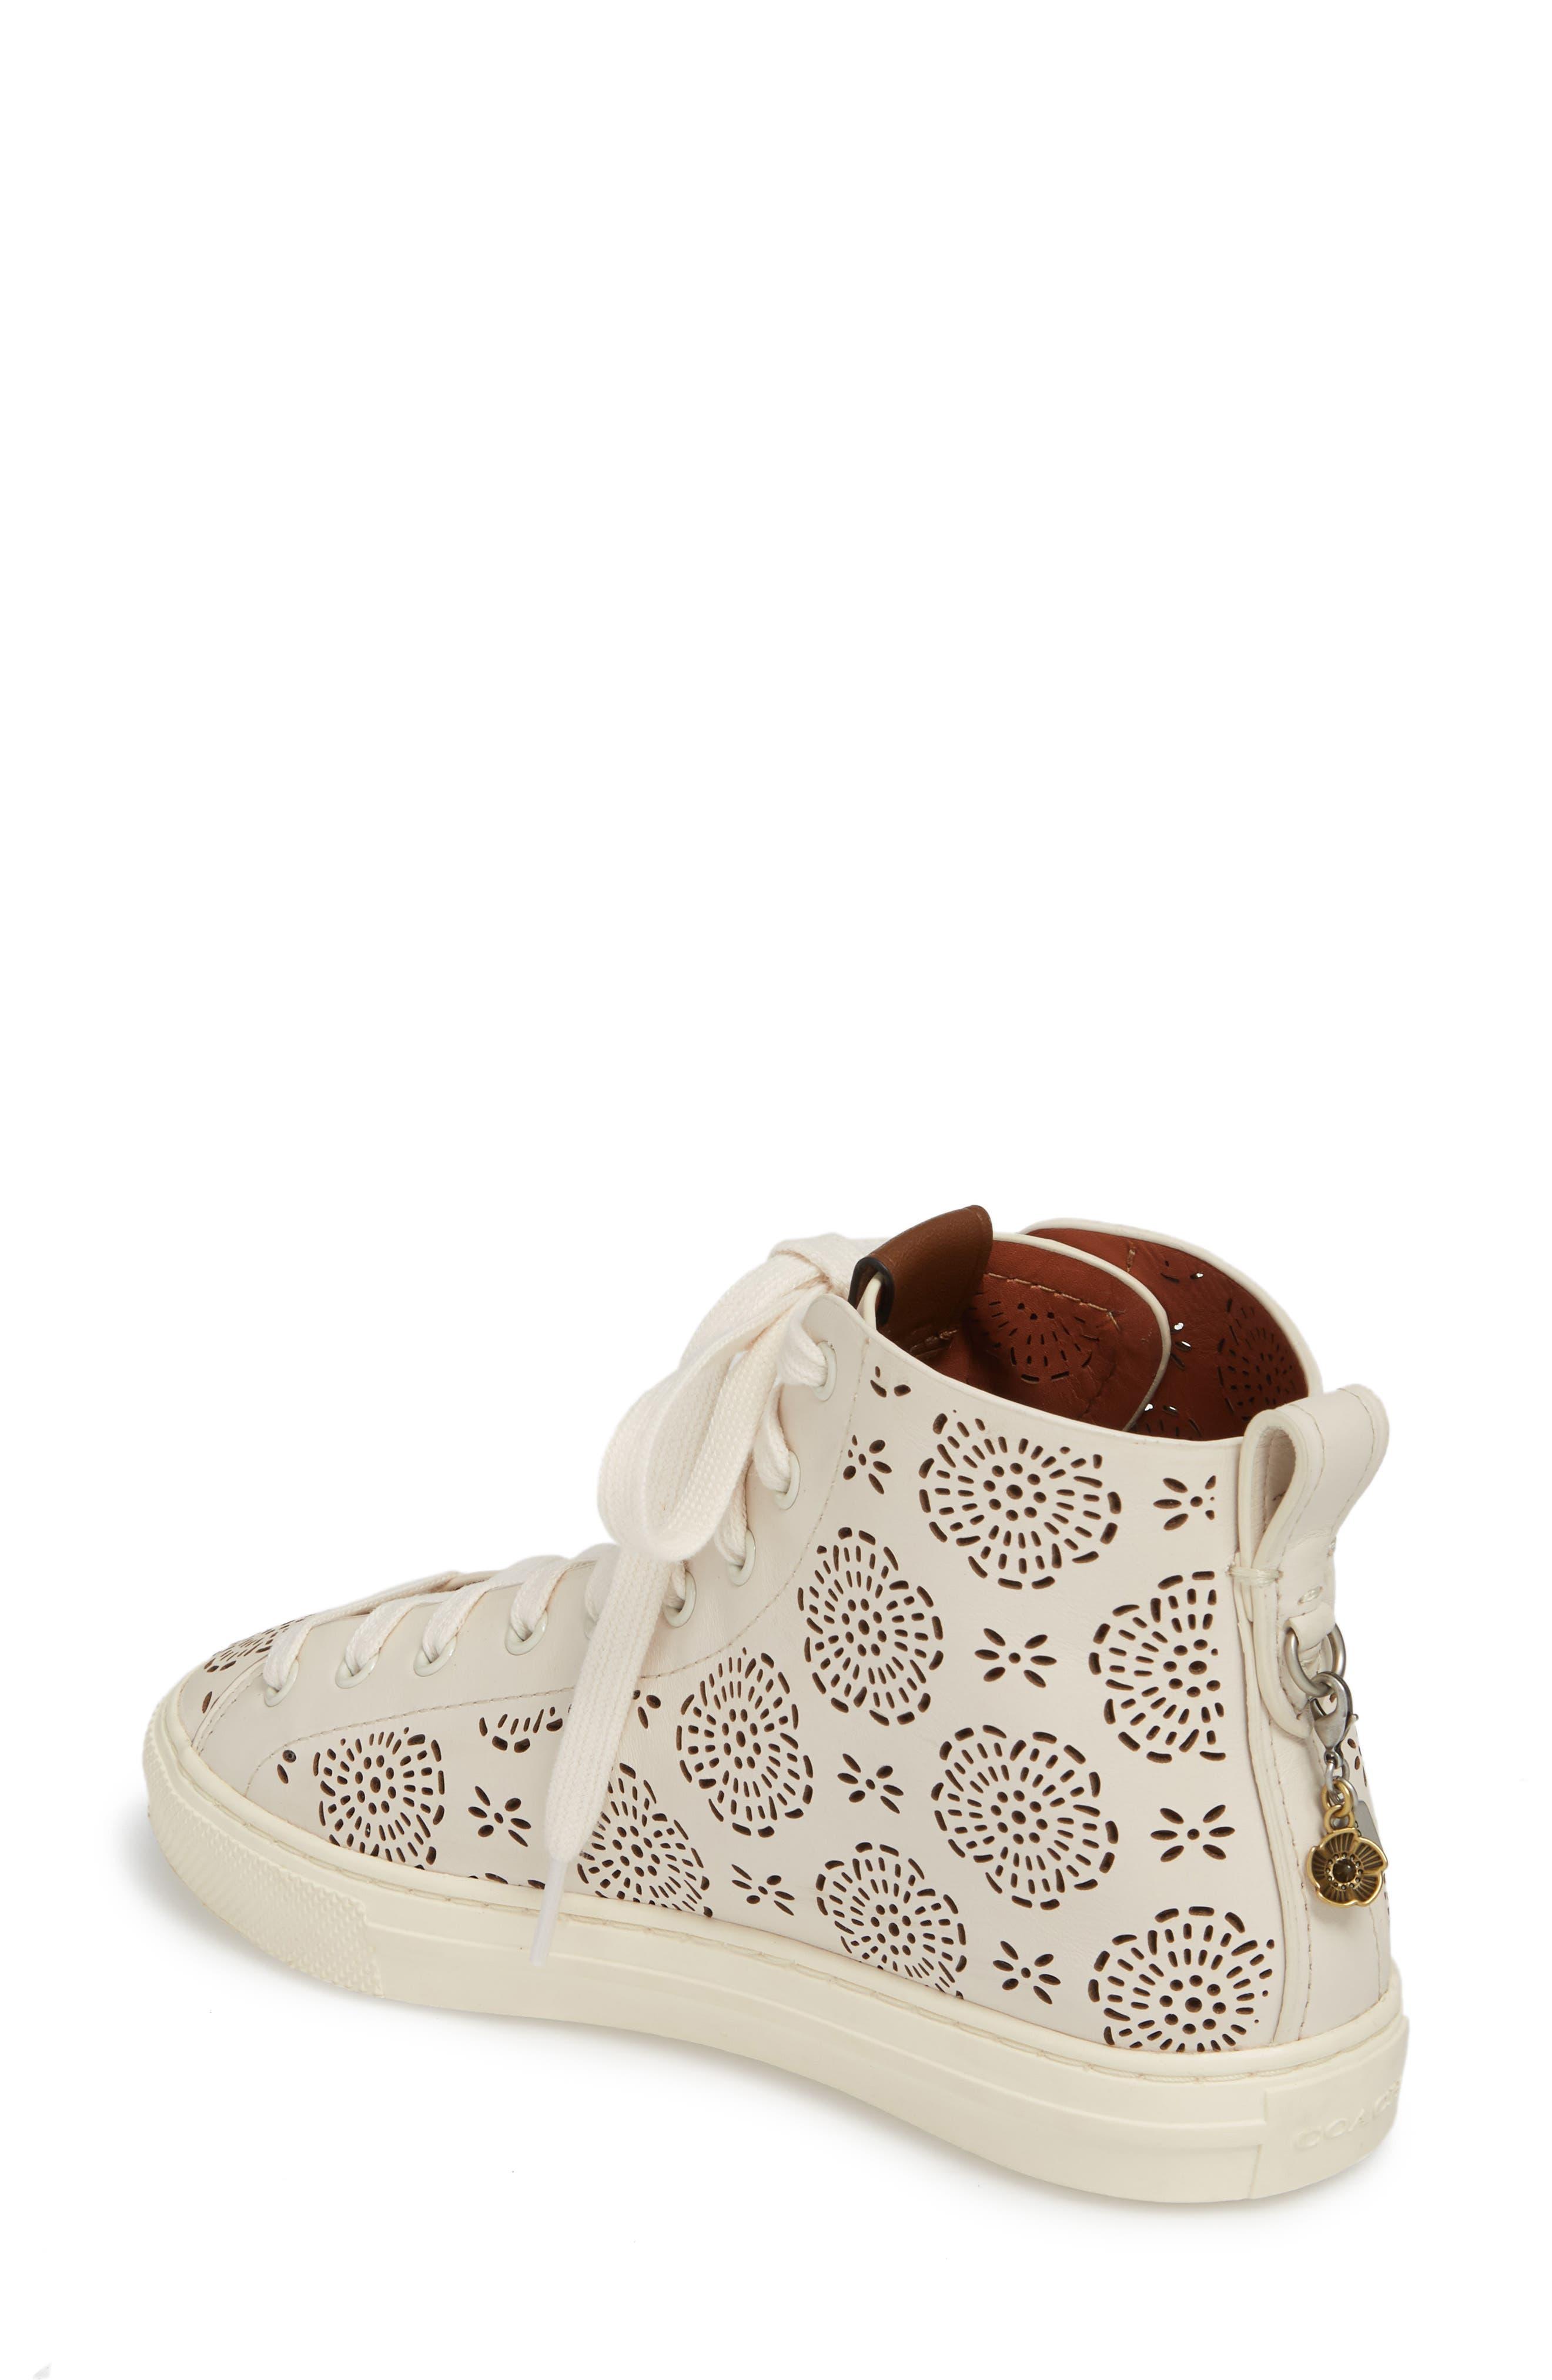 Tea Rose Cutout High Top Sneaker,                             Alternate thumbnail 2, color,                             Chalk Leather